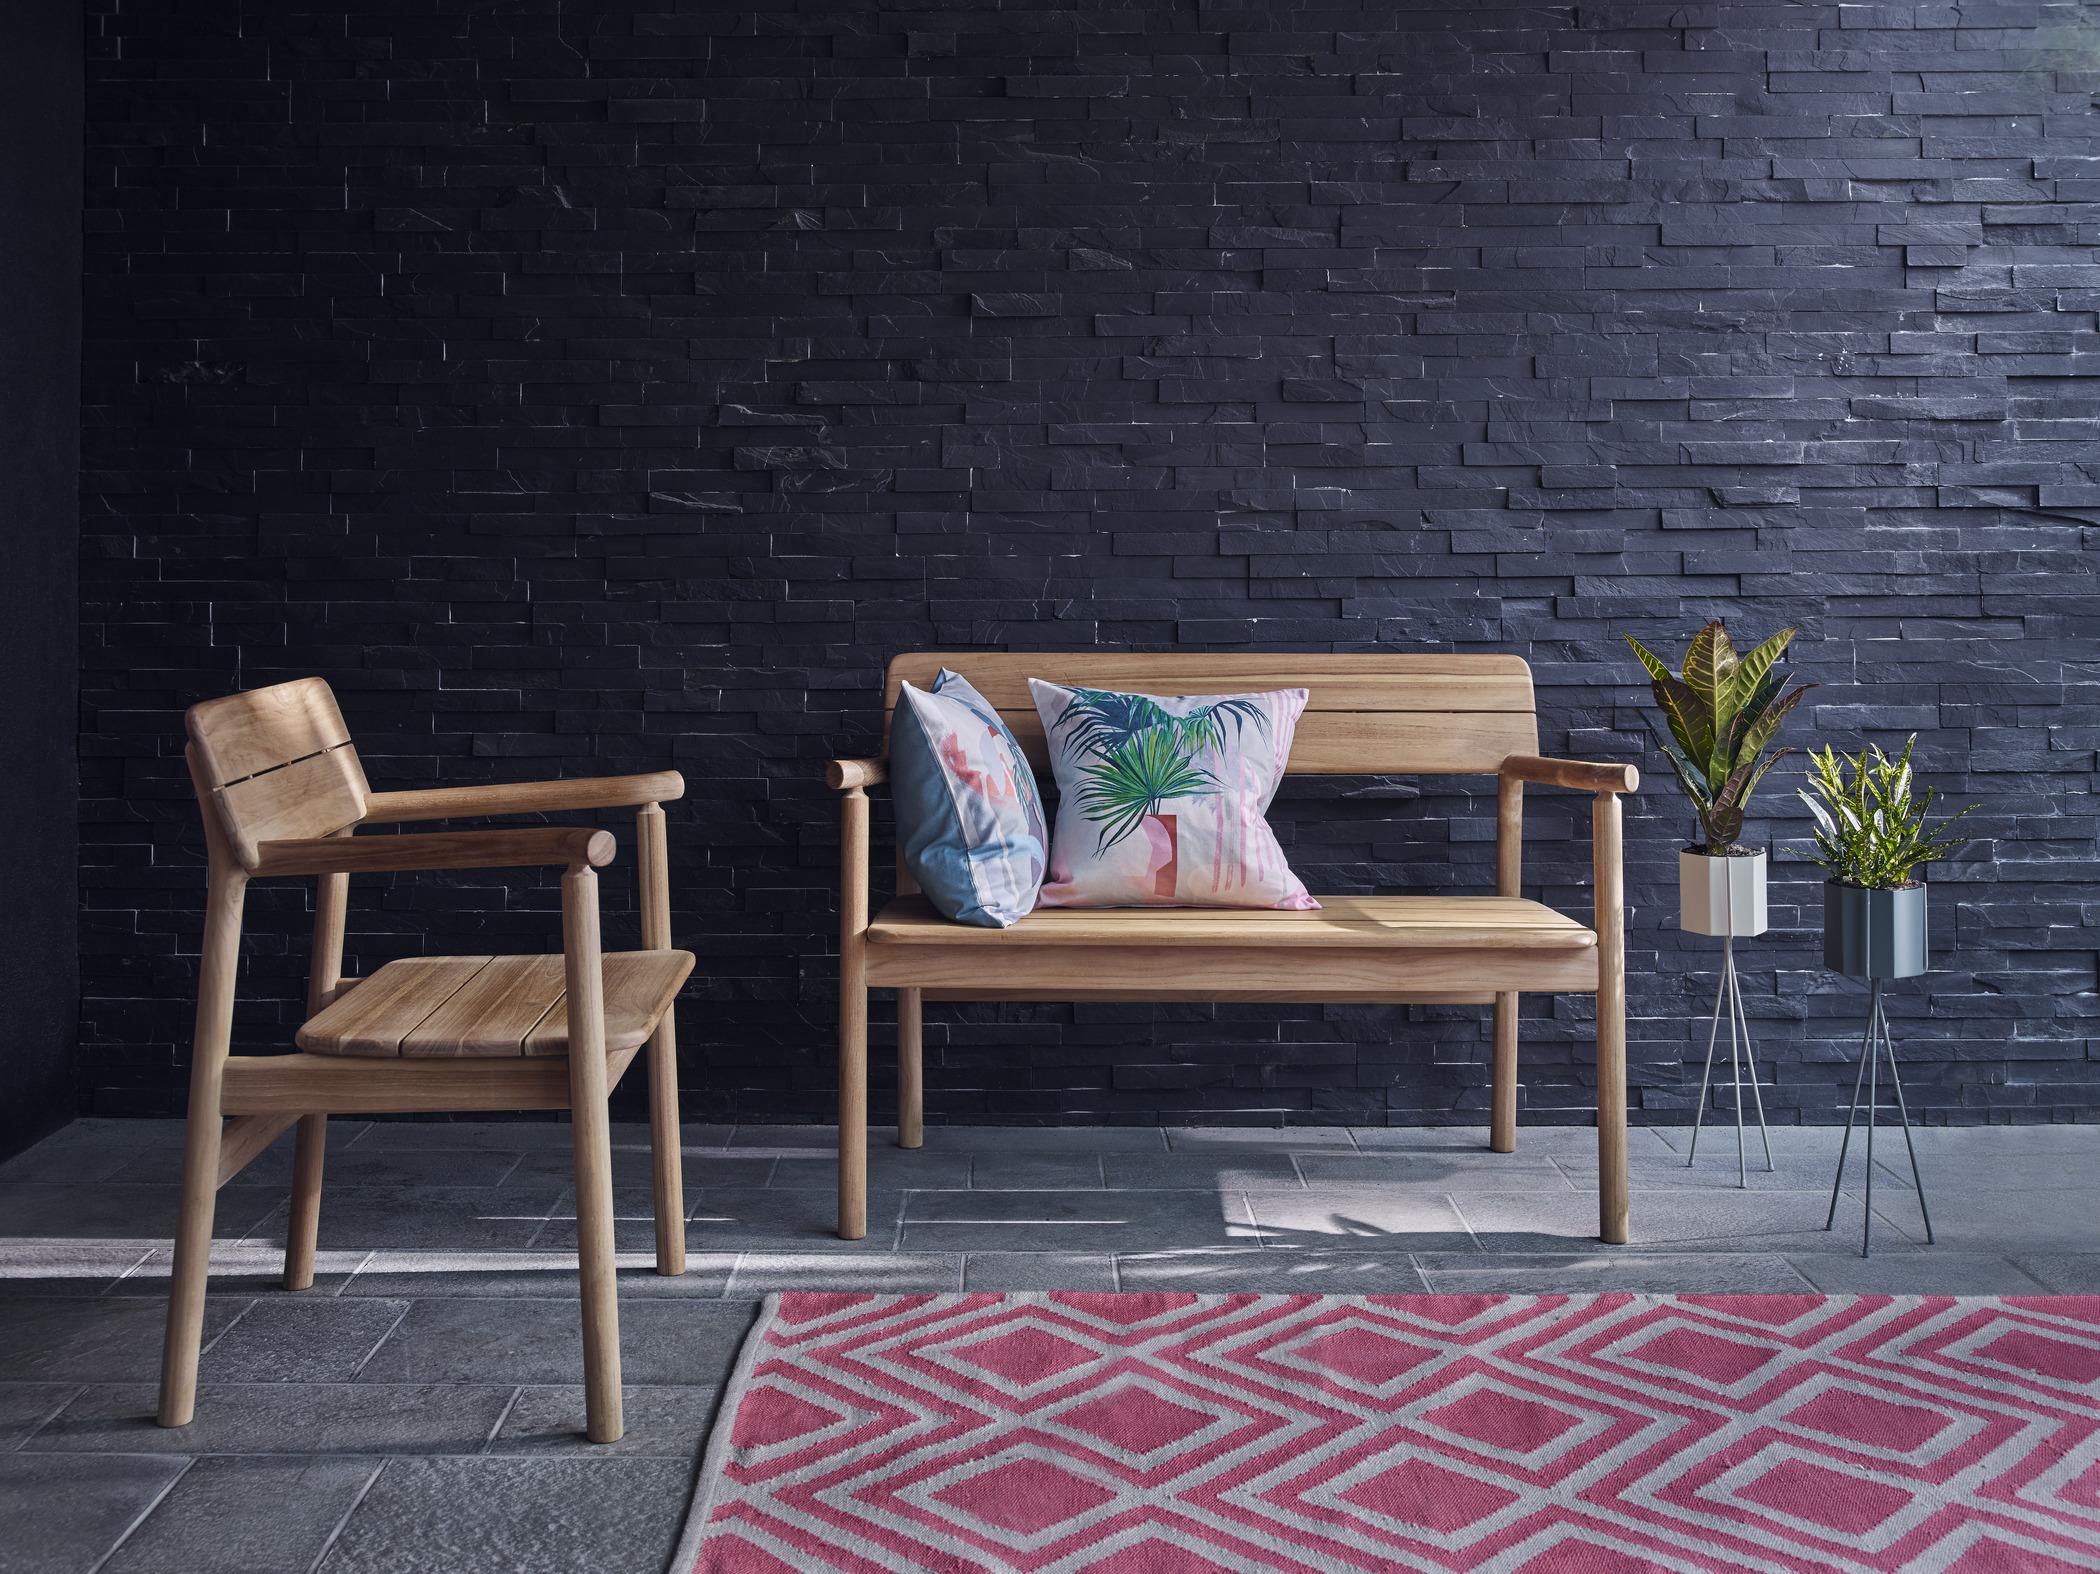 Japandi garden furniture